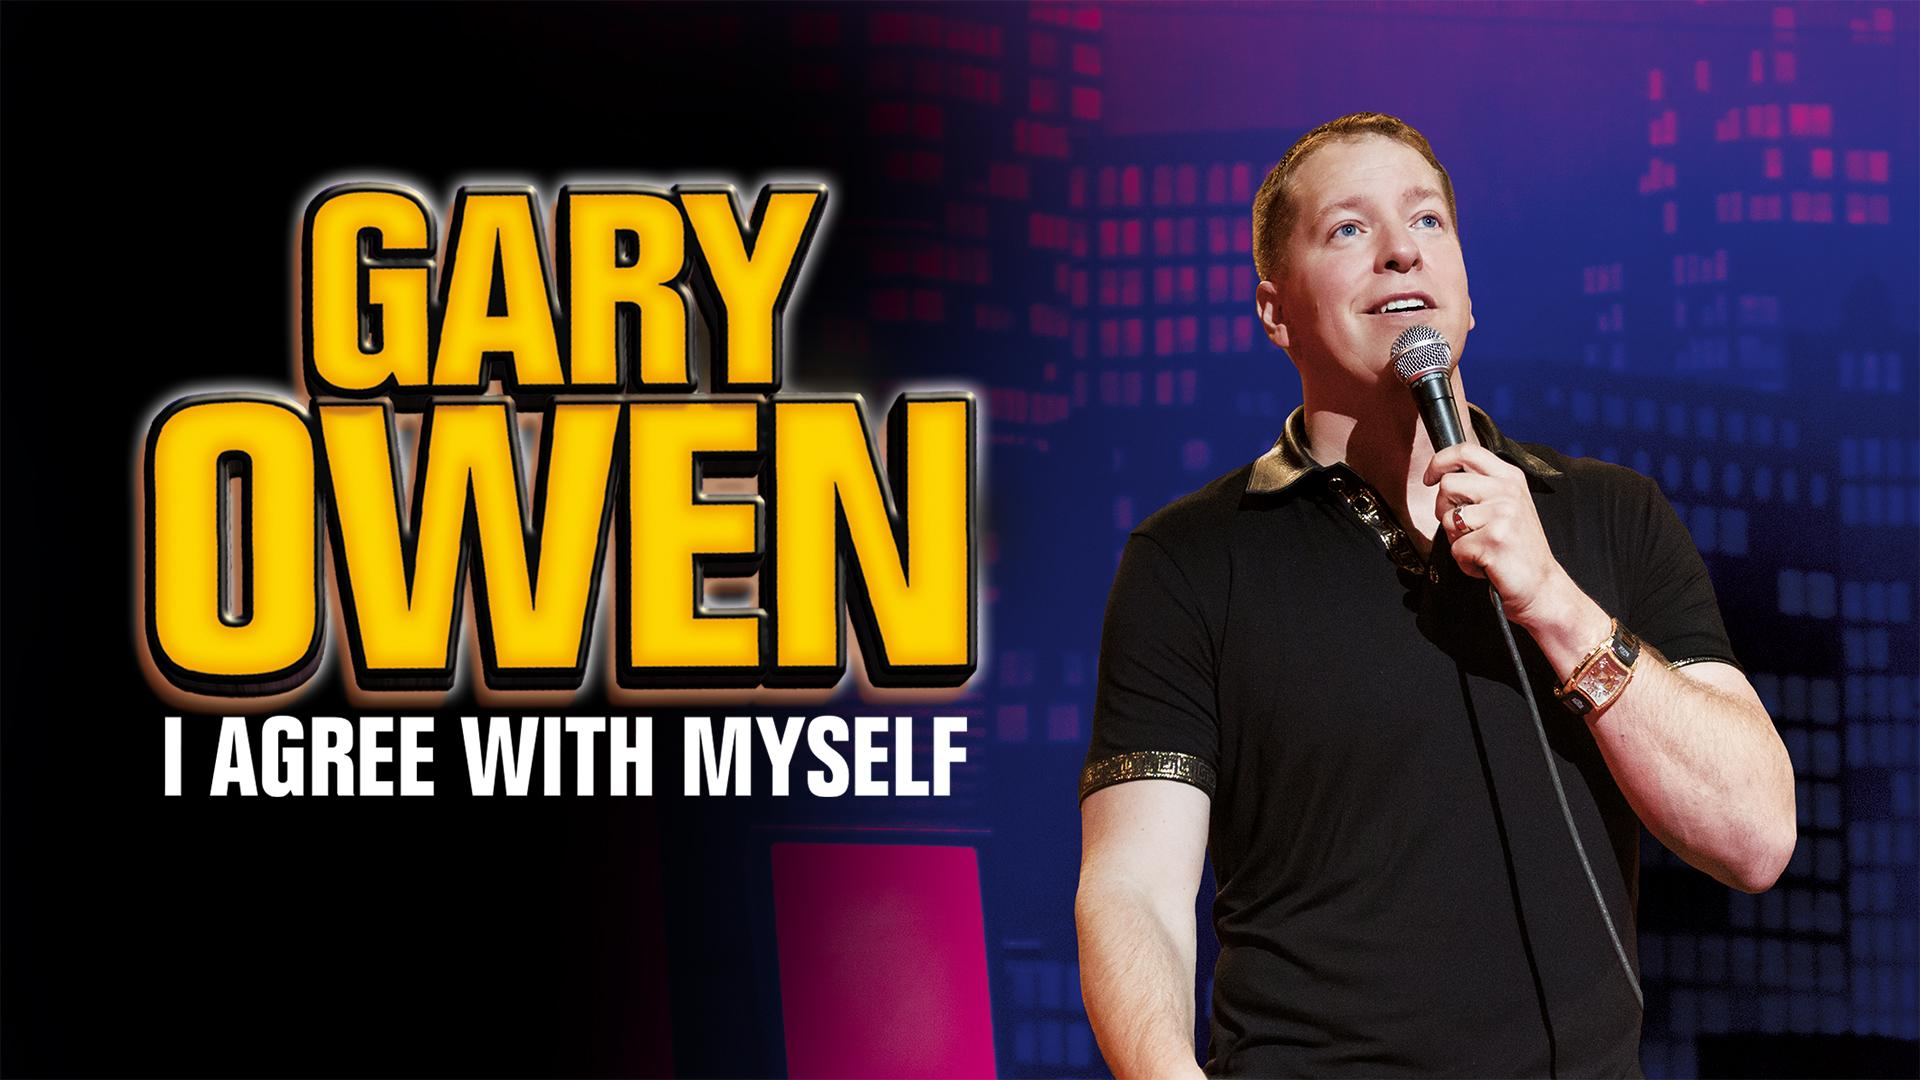 gary-owen-agree